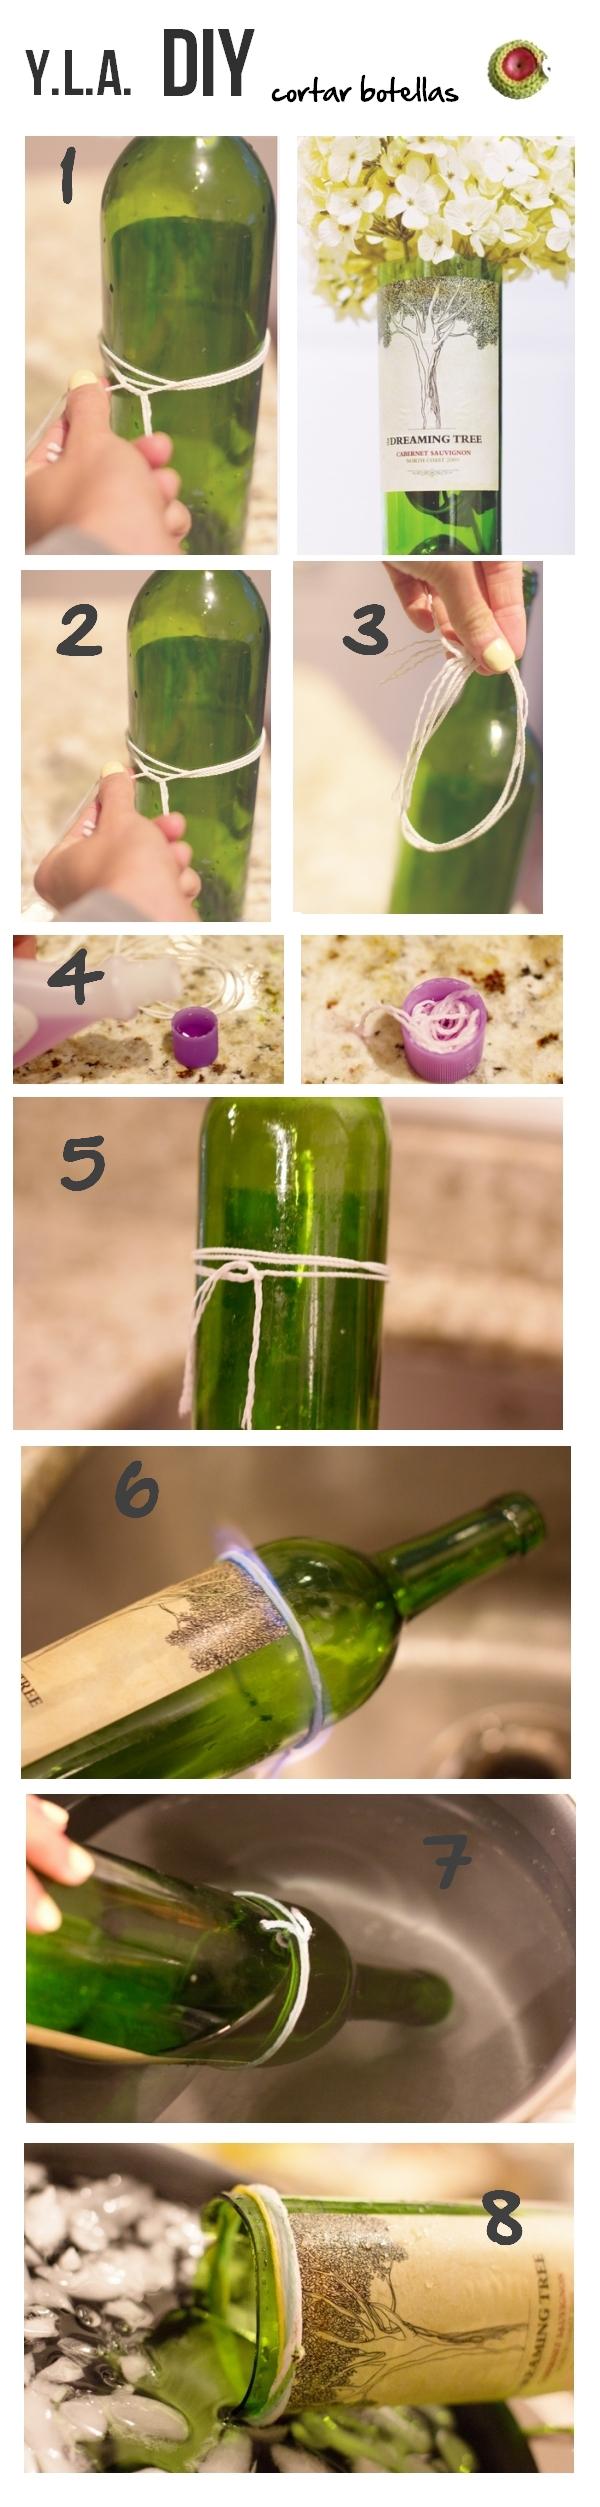 cortar_botellas